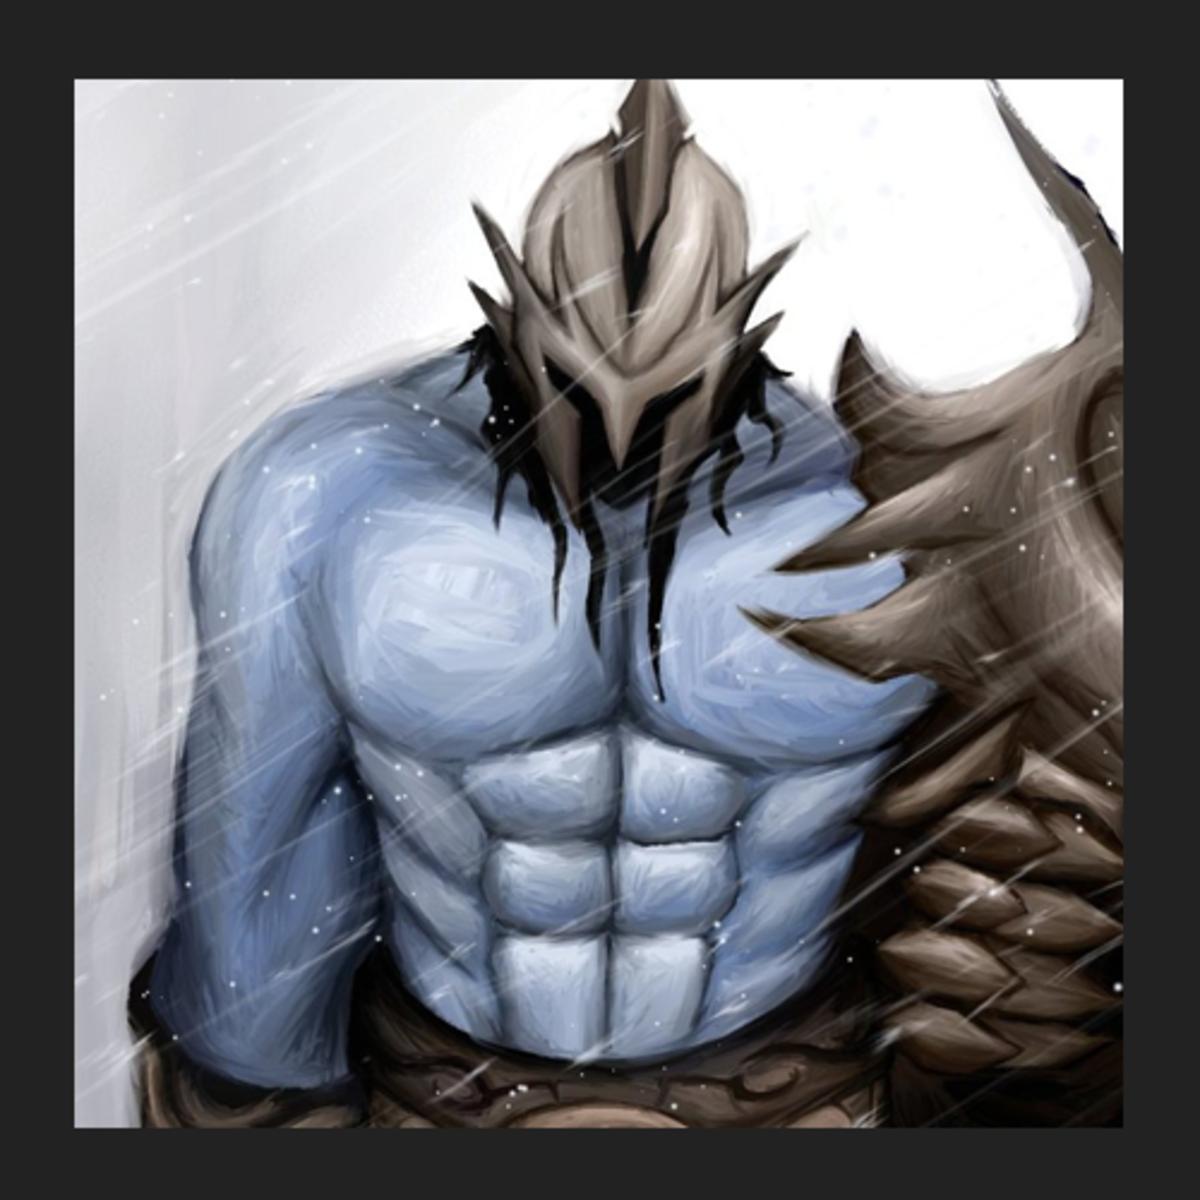 Sven the Rogue Knight fan art